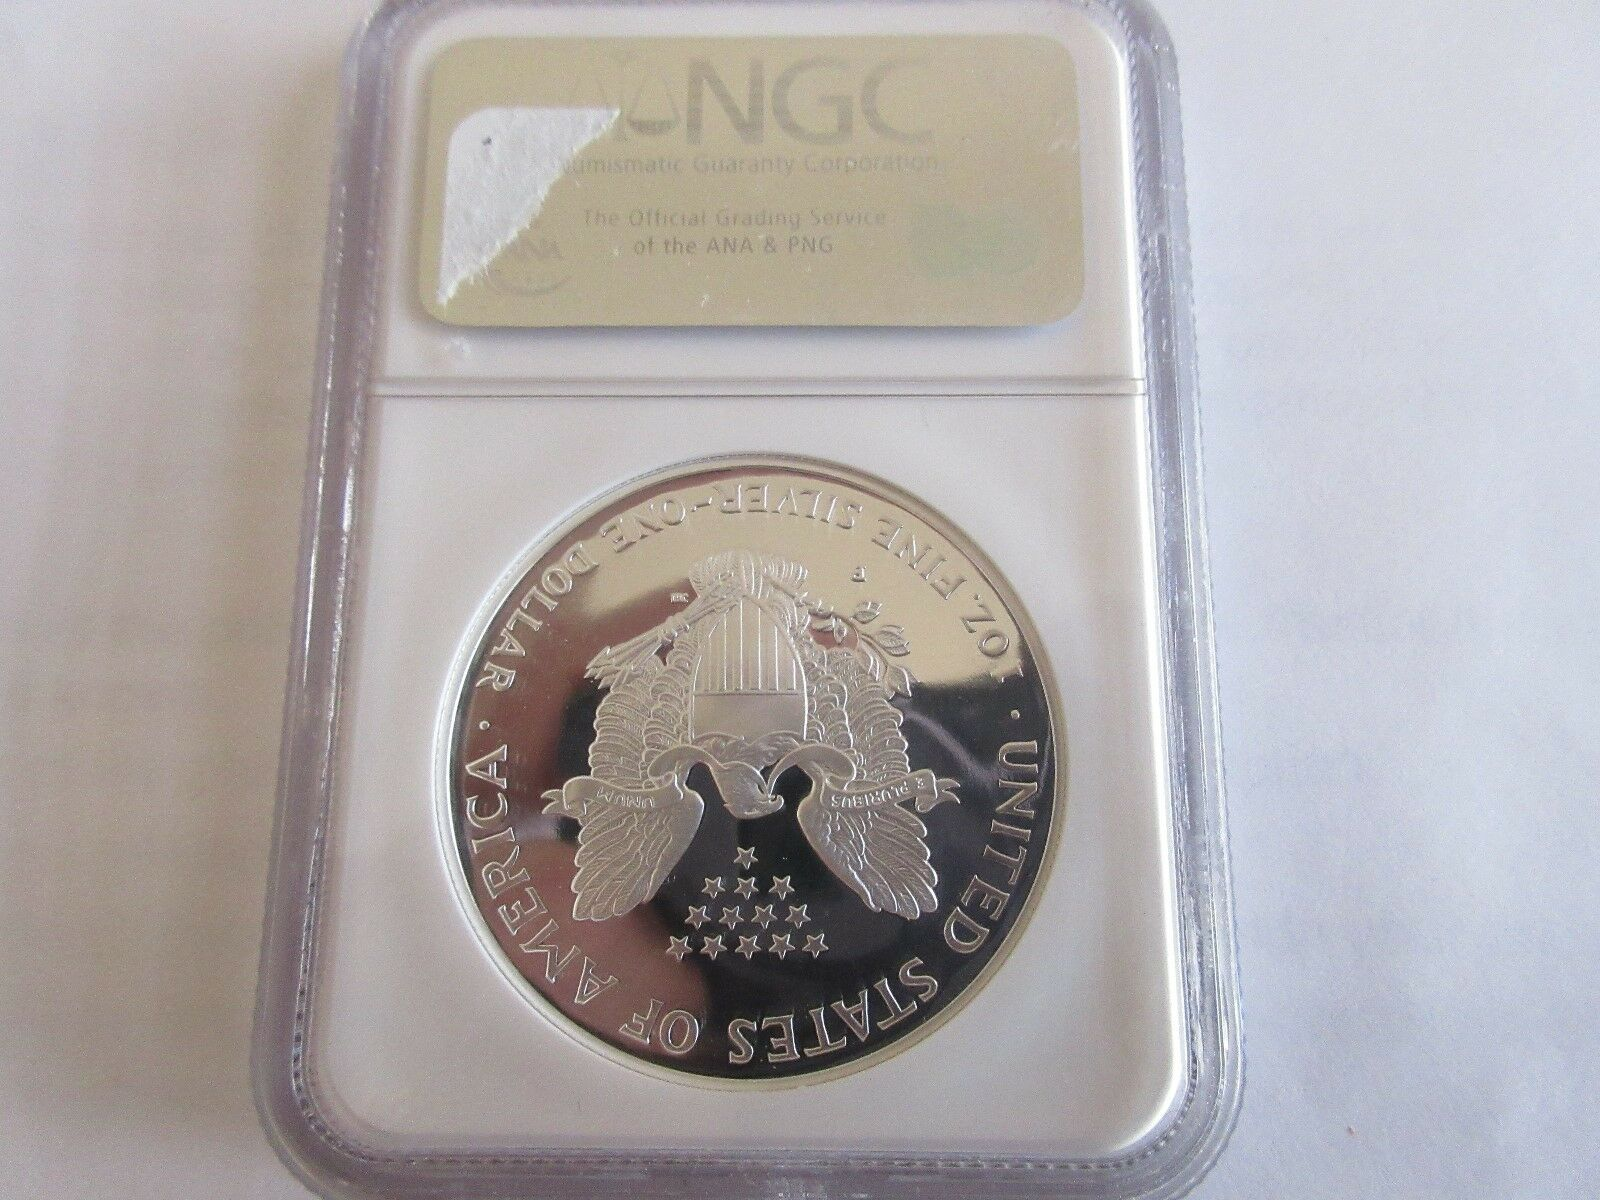 1998 P Silver Eagle S$1 NGC PF 70 Ultra Cameo